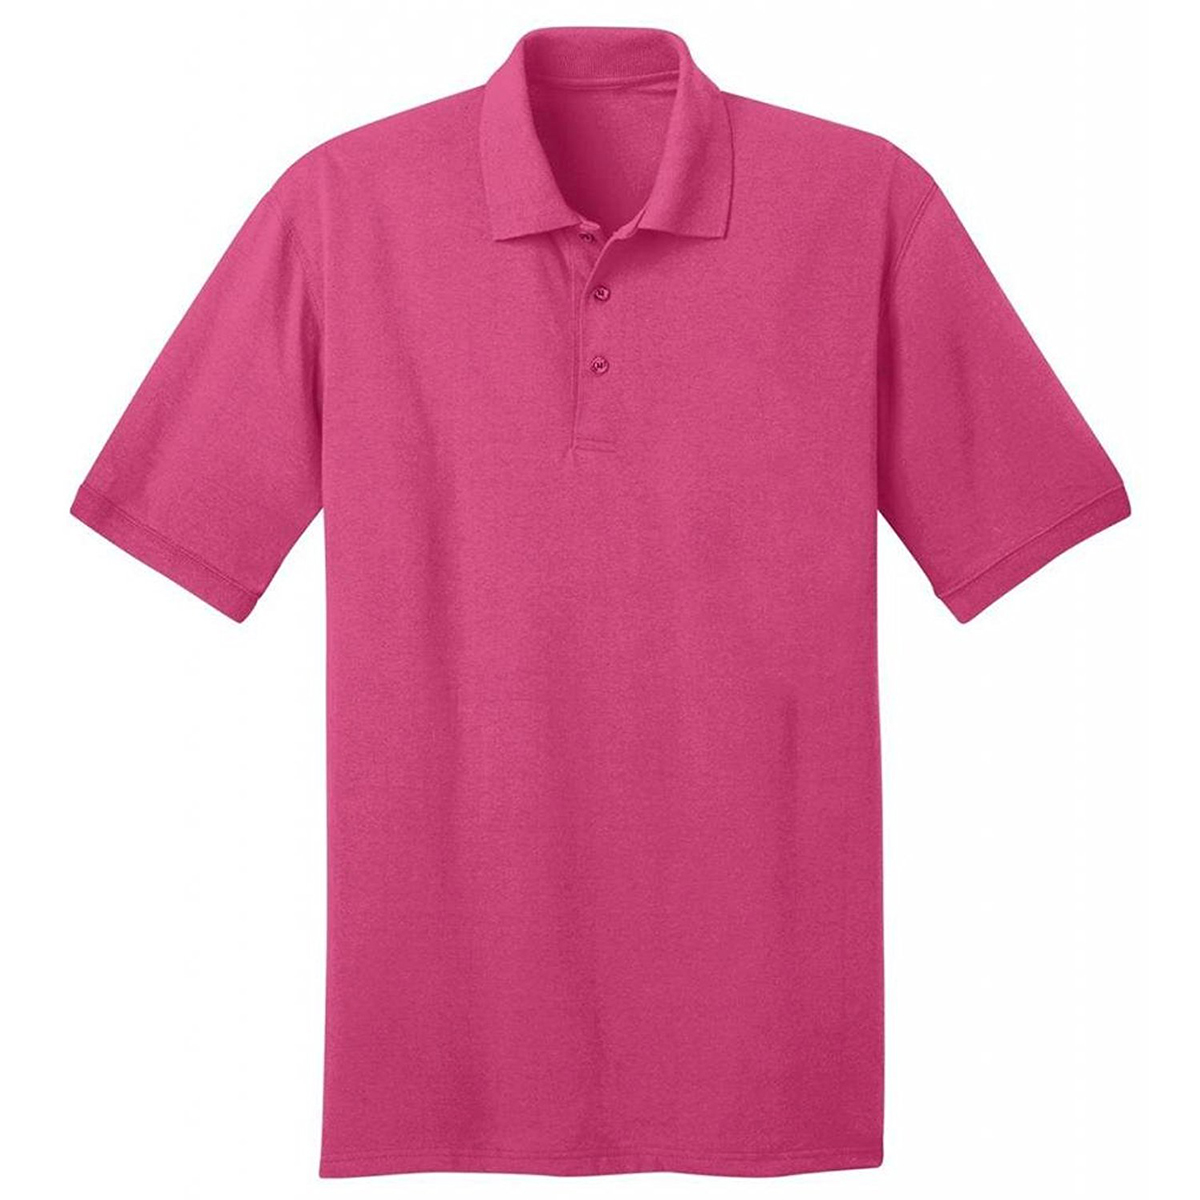 Port & Company Men's Polo T Shirts Short Sleeve Cotton Casual Golf ...